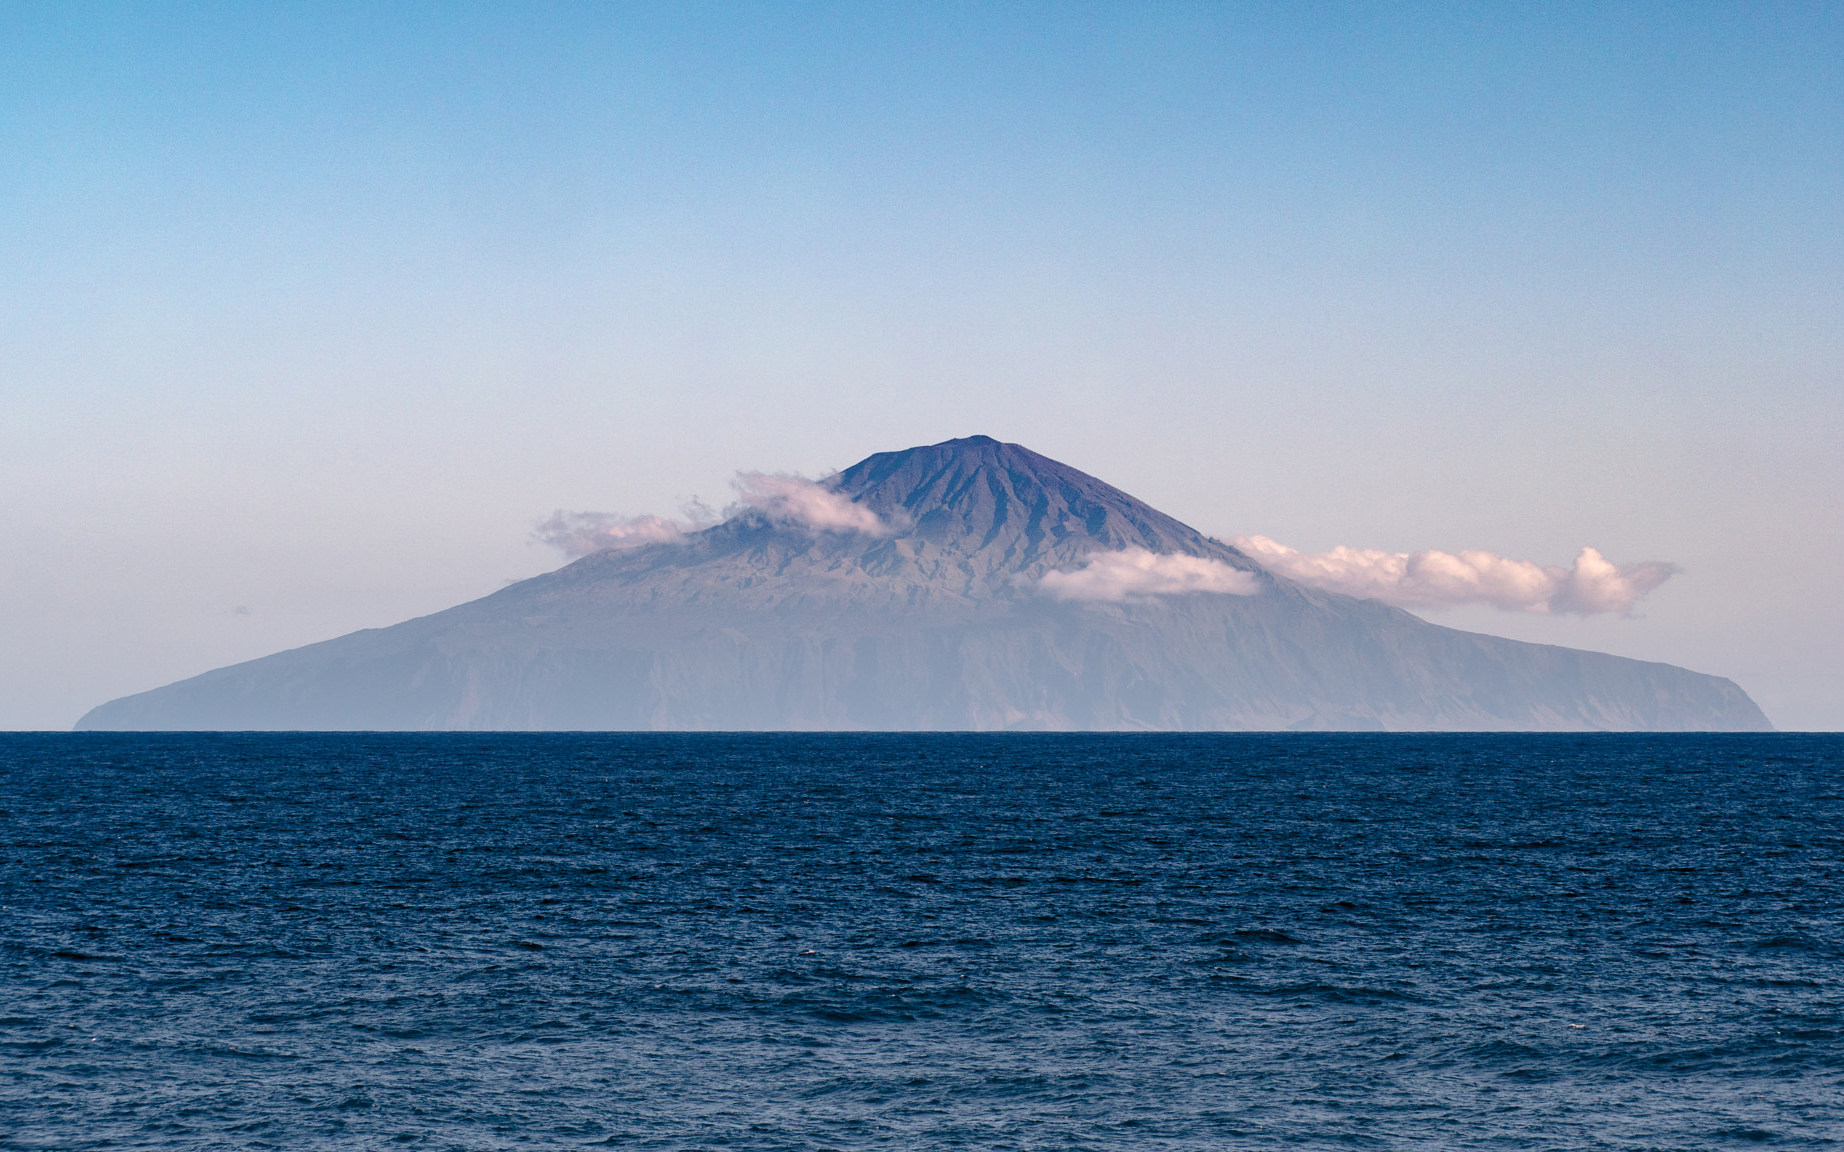 atlantische Inseln (Tristan da Cunha, St. Helena, Ascension)